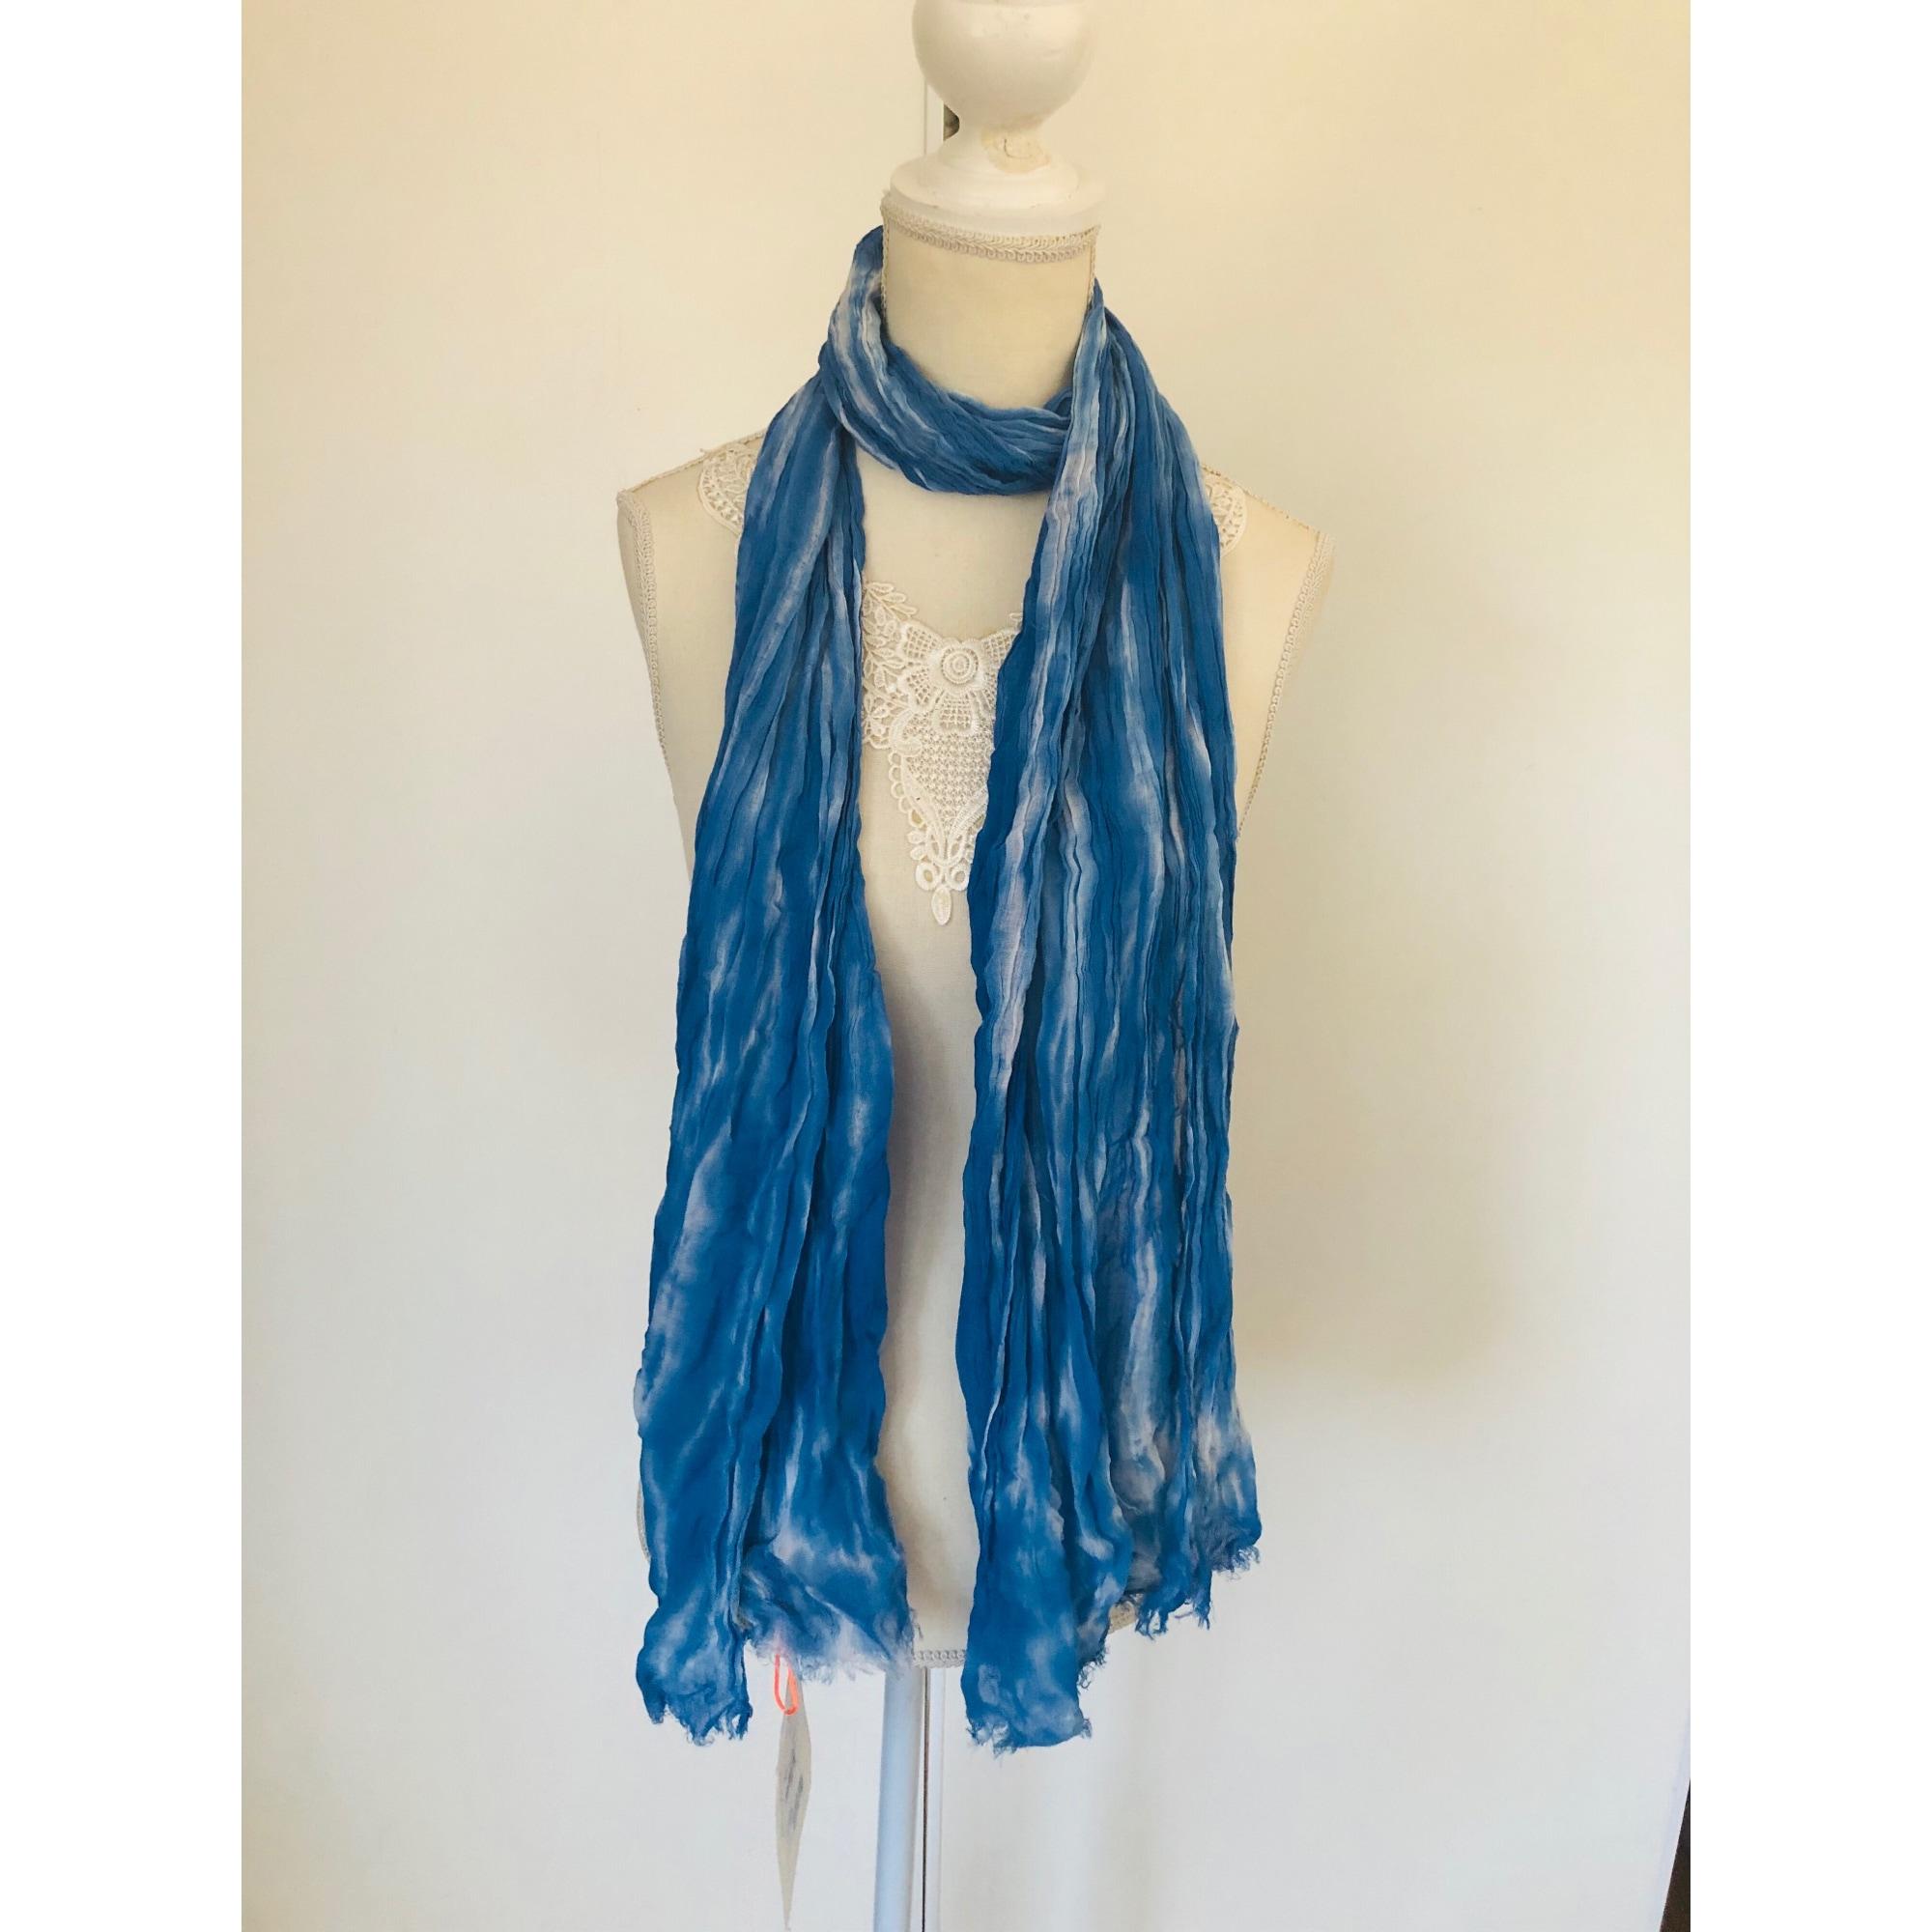 Foulard LE TEMPS DES CERISES Bleu, bleu marine, bleu turquoise